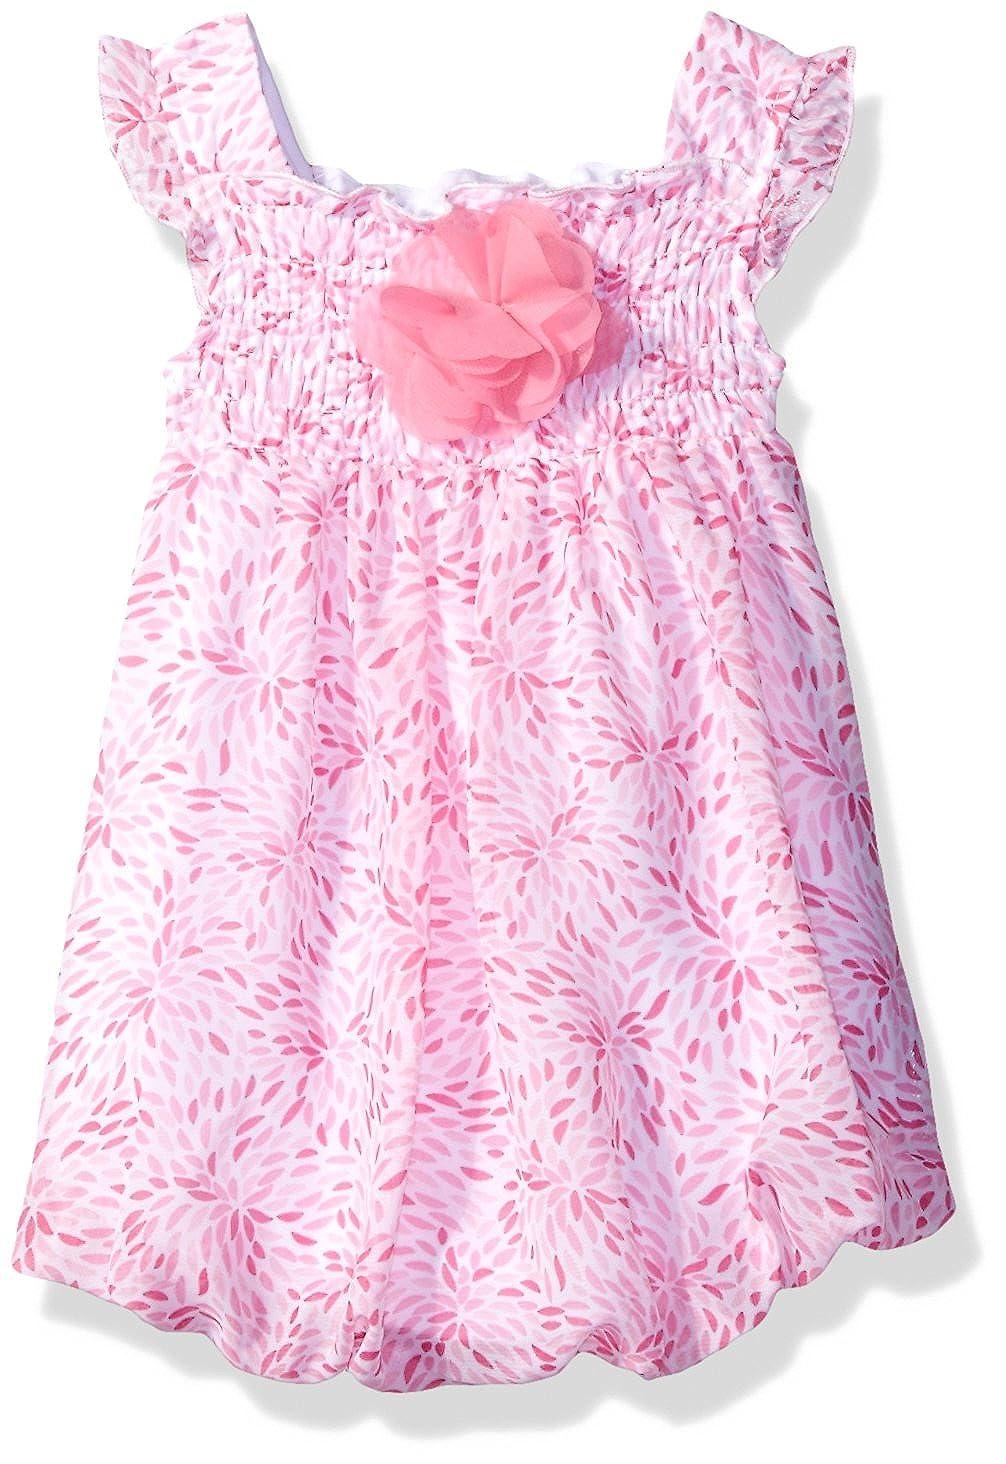 Bon Bebe DRESS ベビーガールズ 0 - 3 Months Pretty Pink Flower B01MXLU1XZ